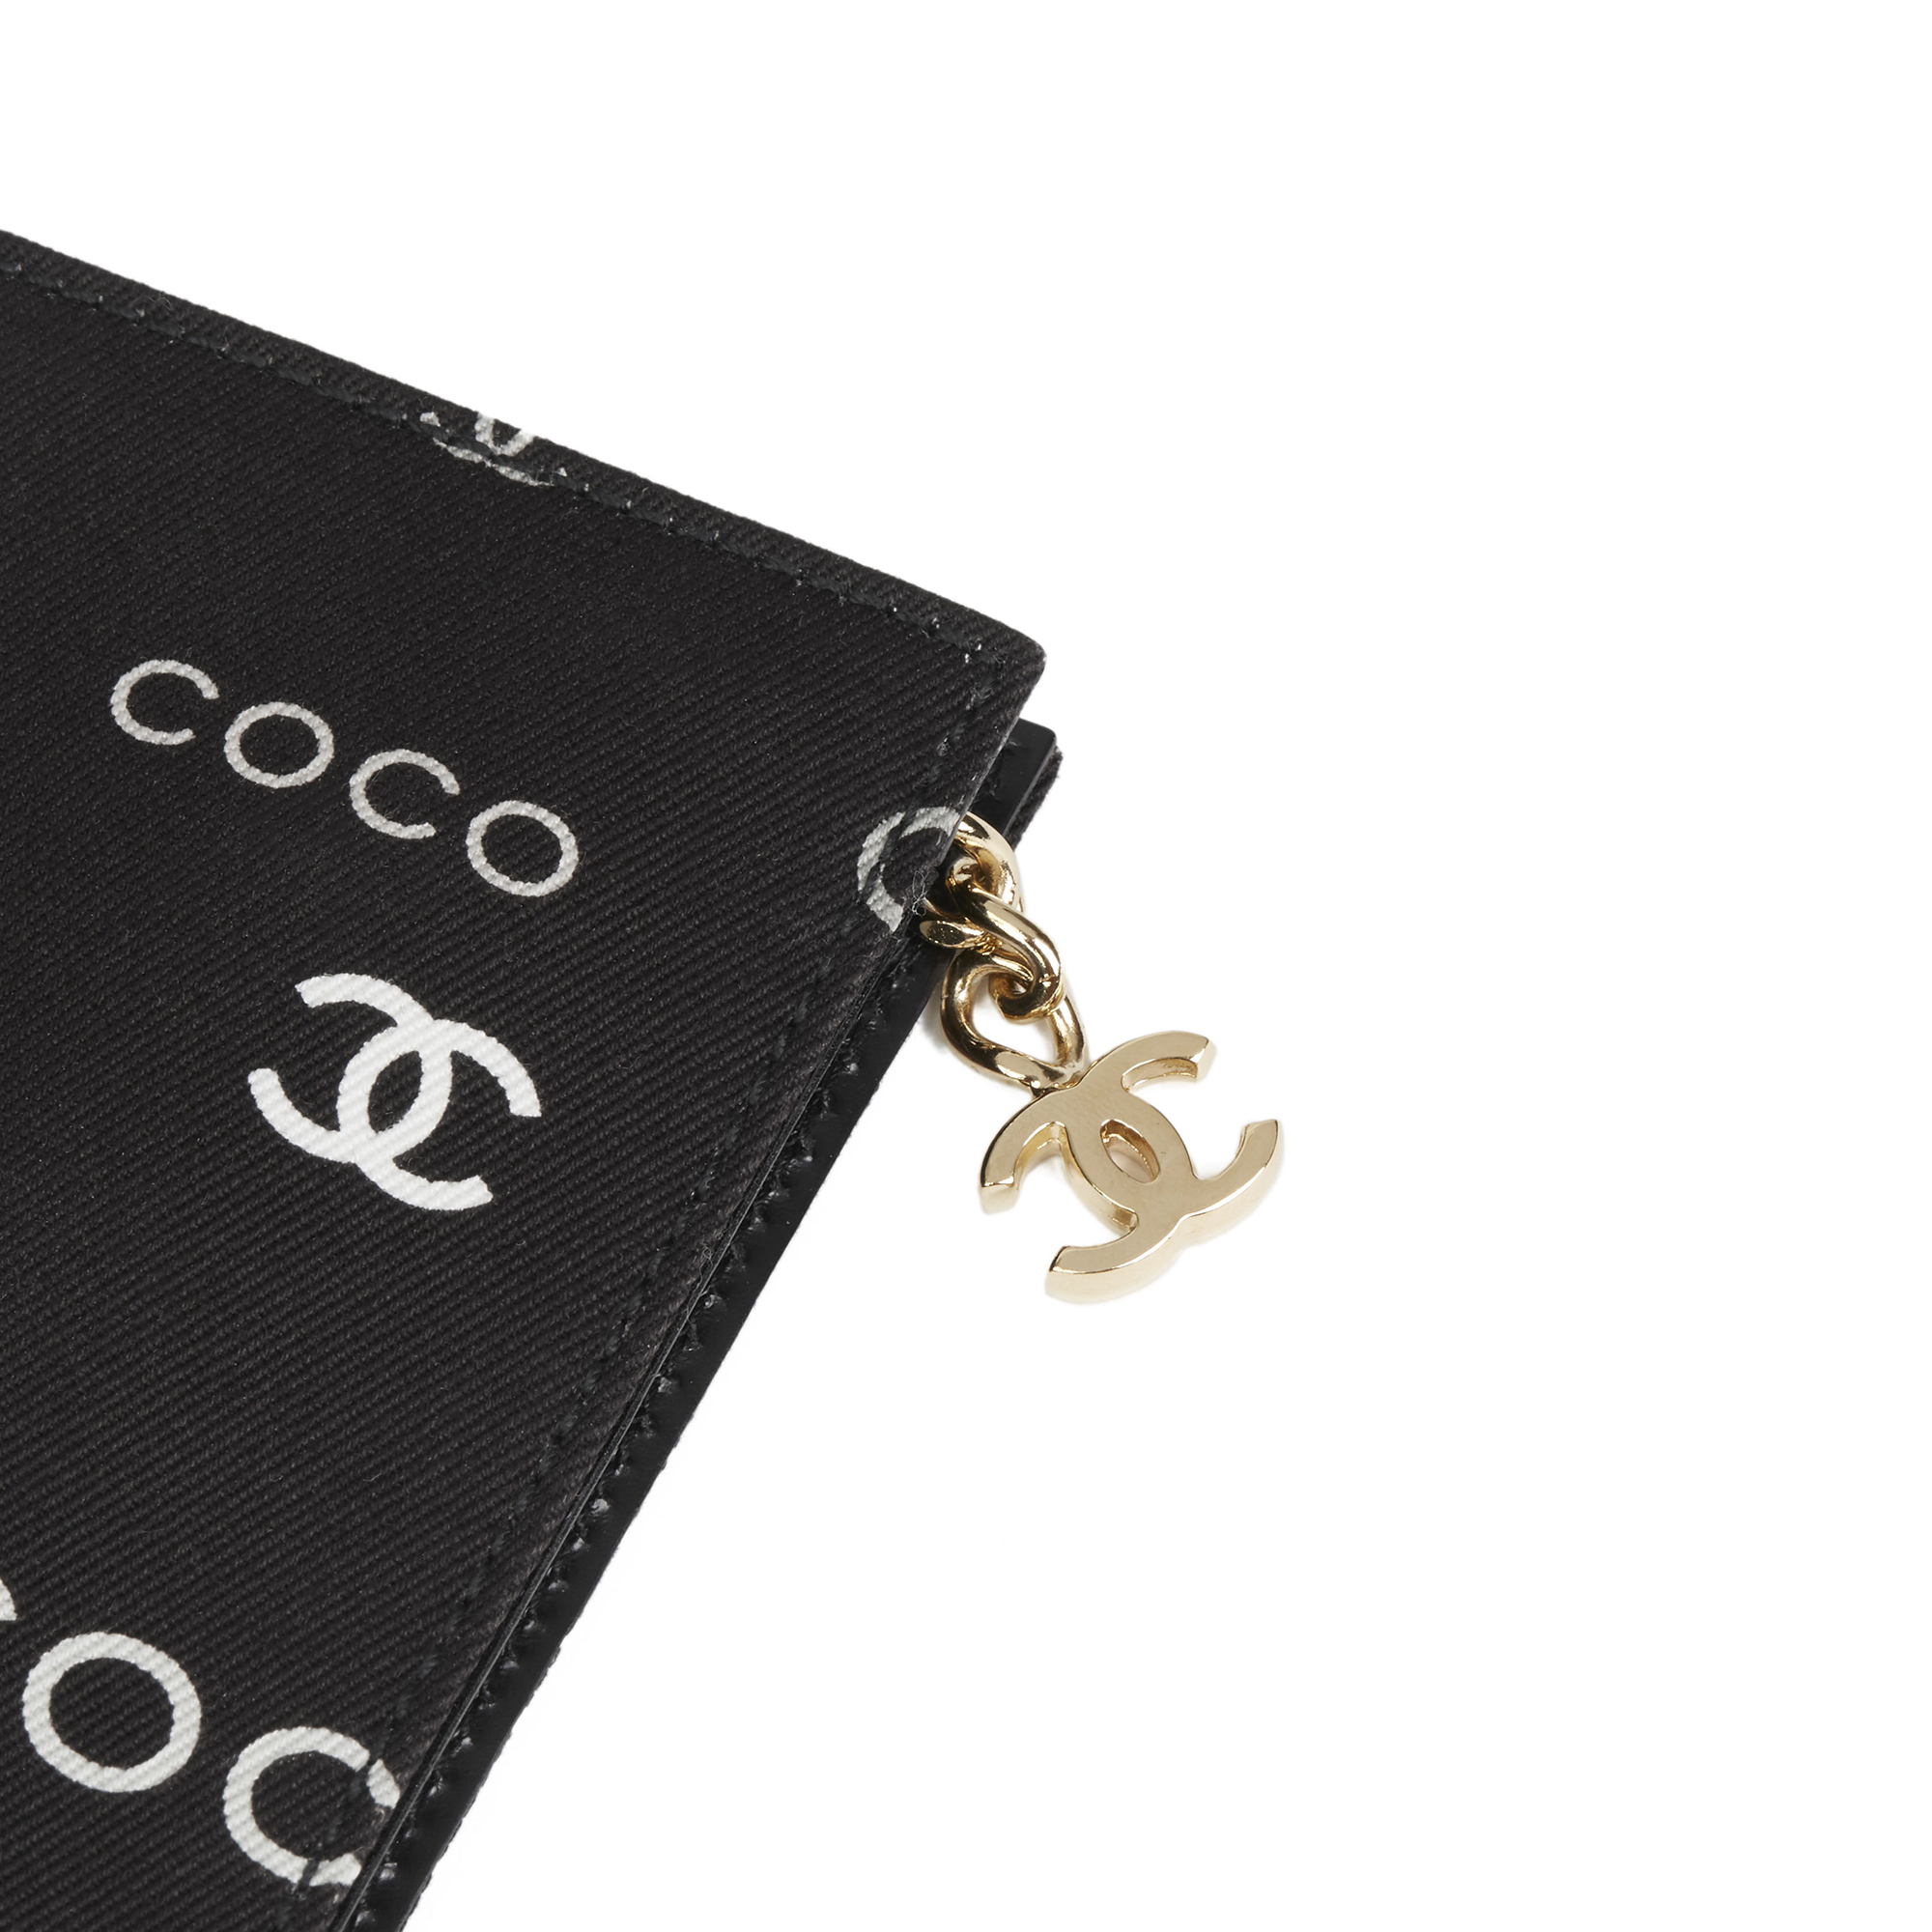 84688deeaeb8 CHANEL BLACK CANVAS COCO POUCH HB2720 | eBay